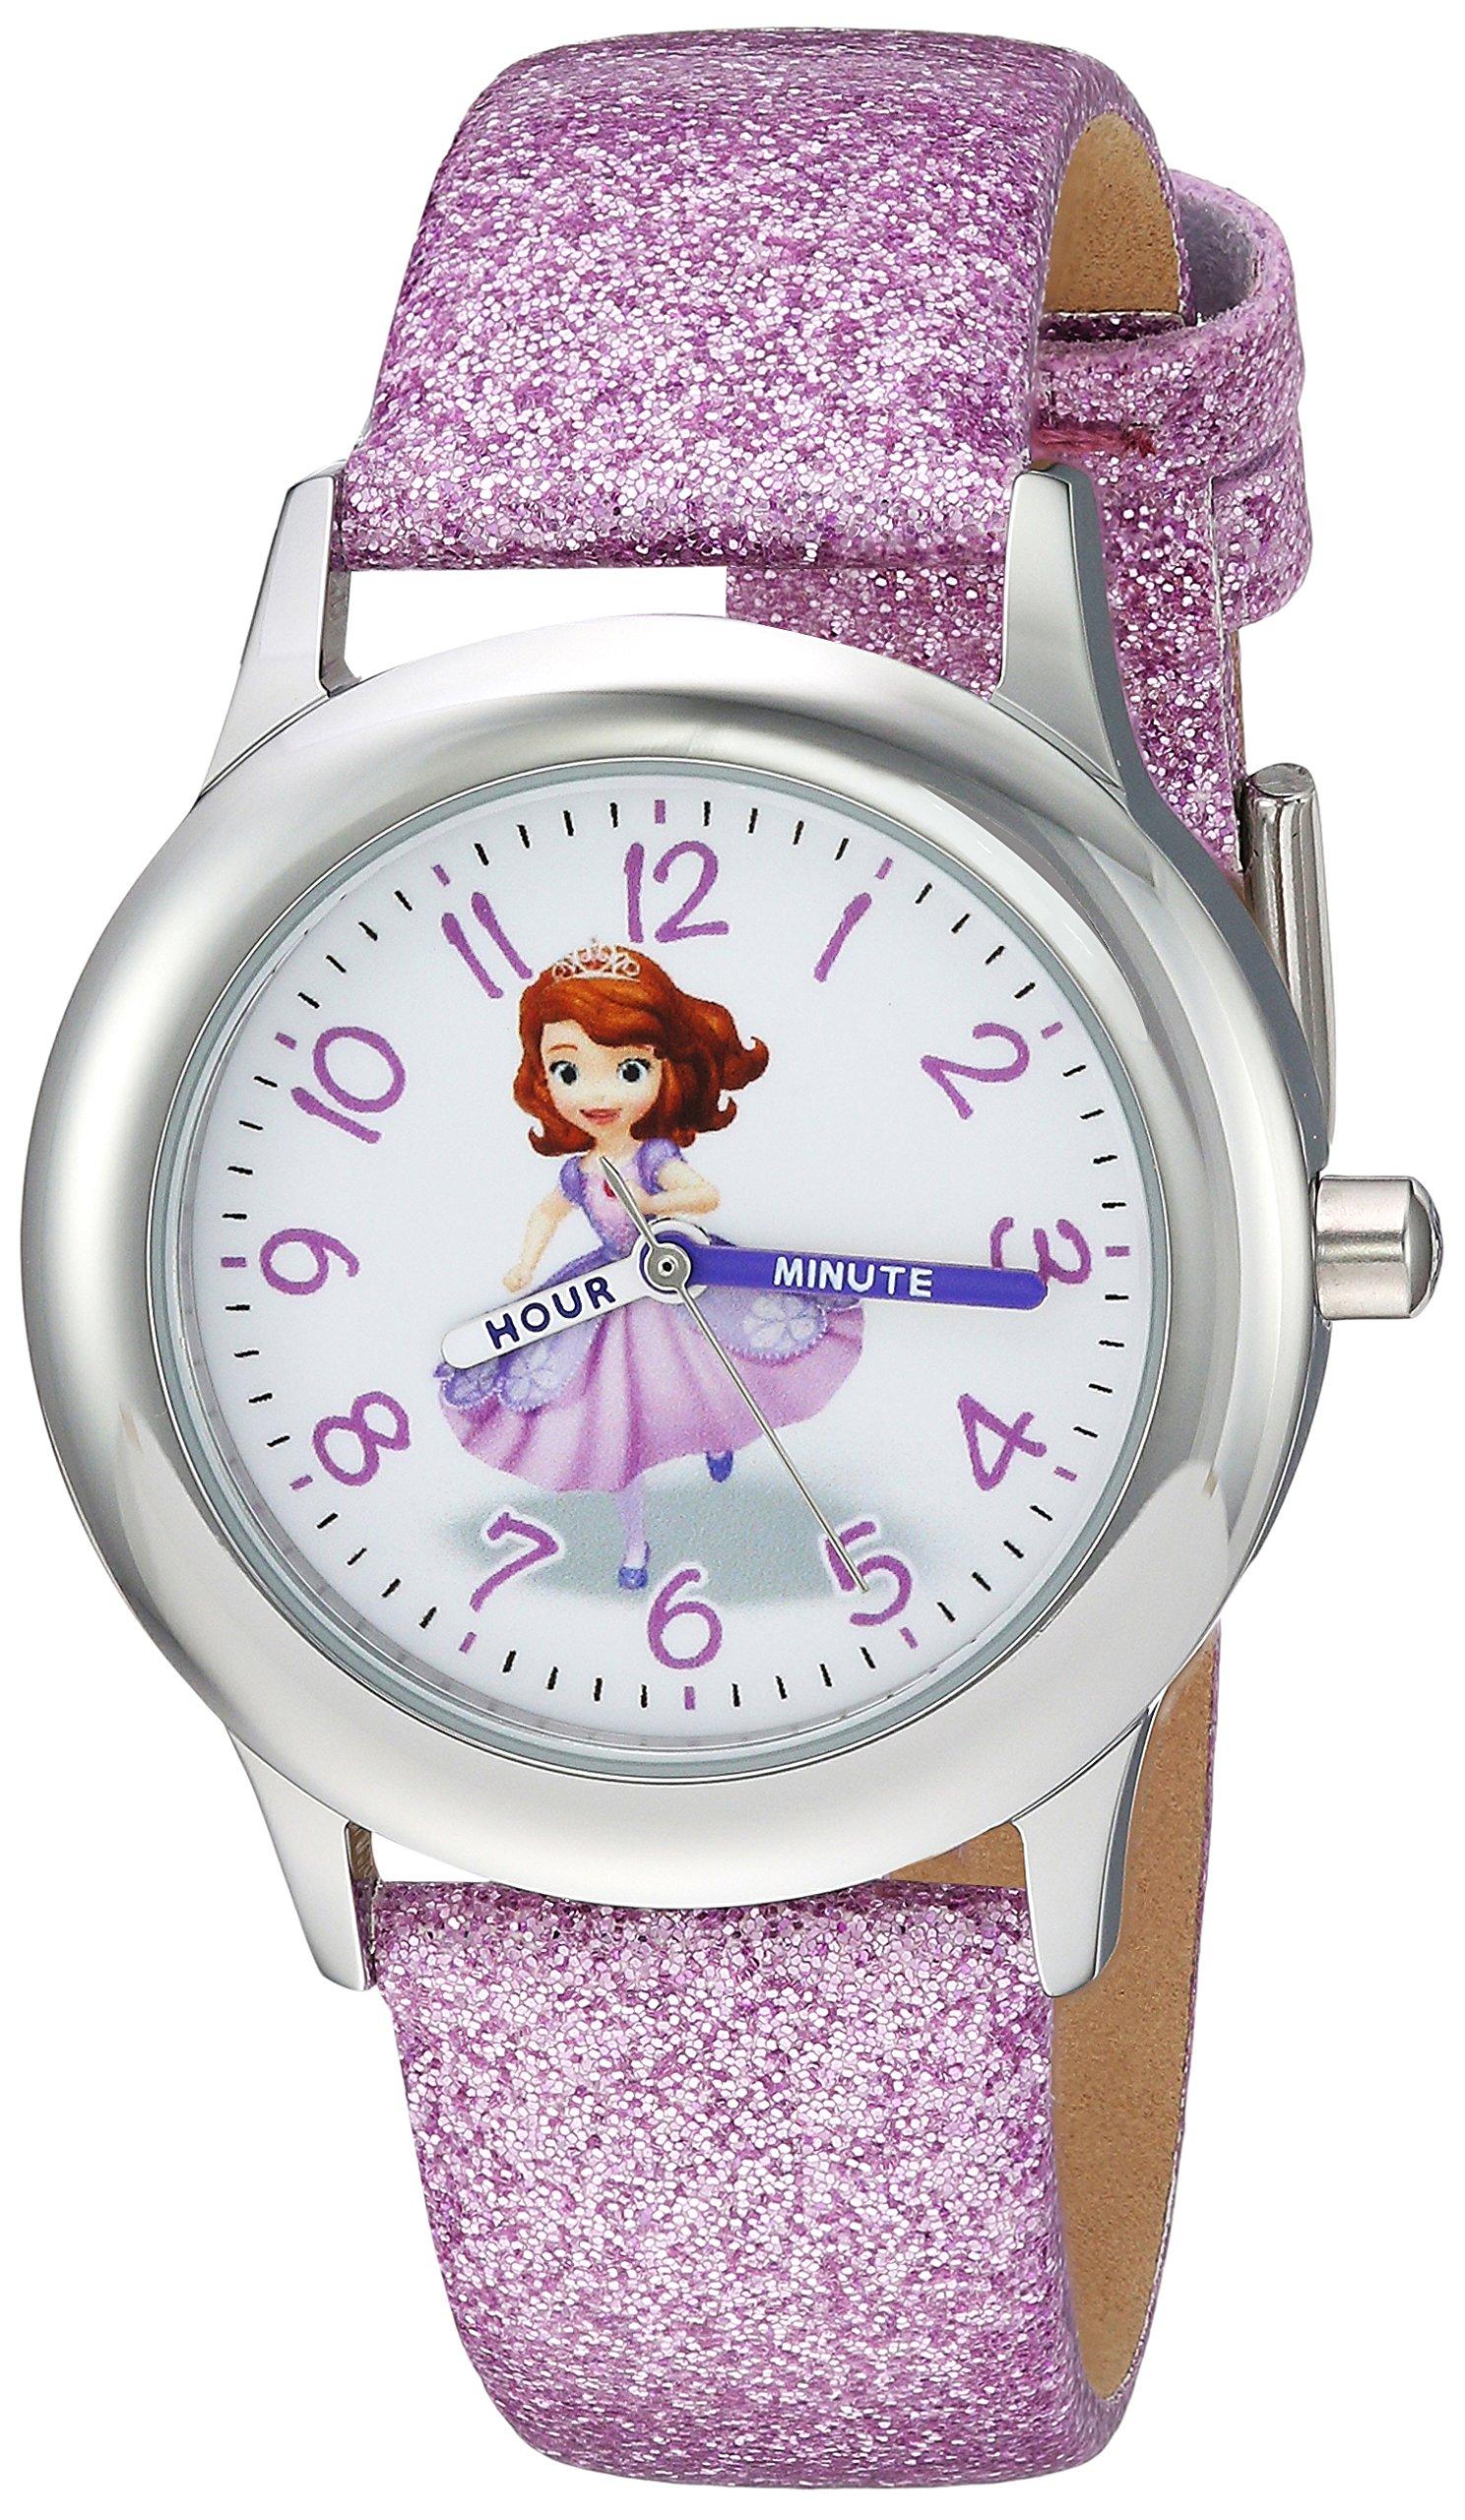 DISNEY Girls Princess Sofia Stainless Steel Analog-Quartz Watch with Leather-Synthetic Strap, Purple, 15 (Model: WDS000269)